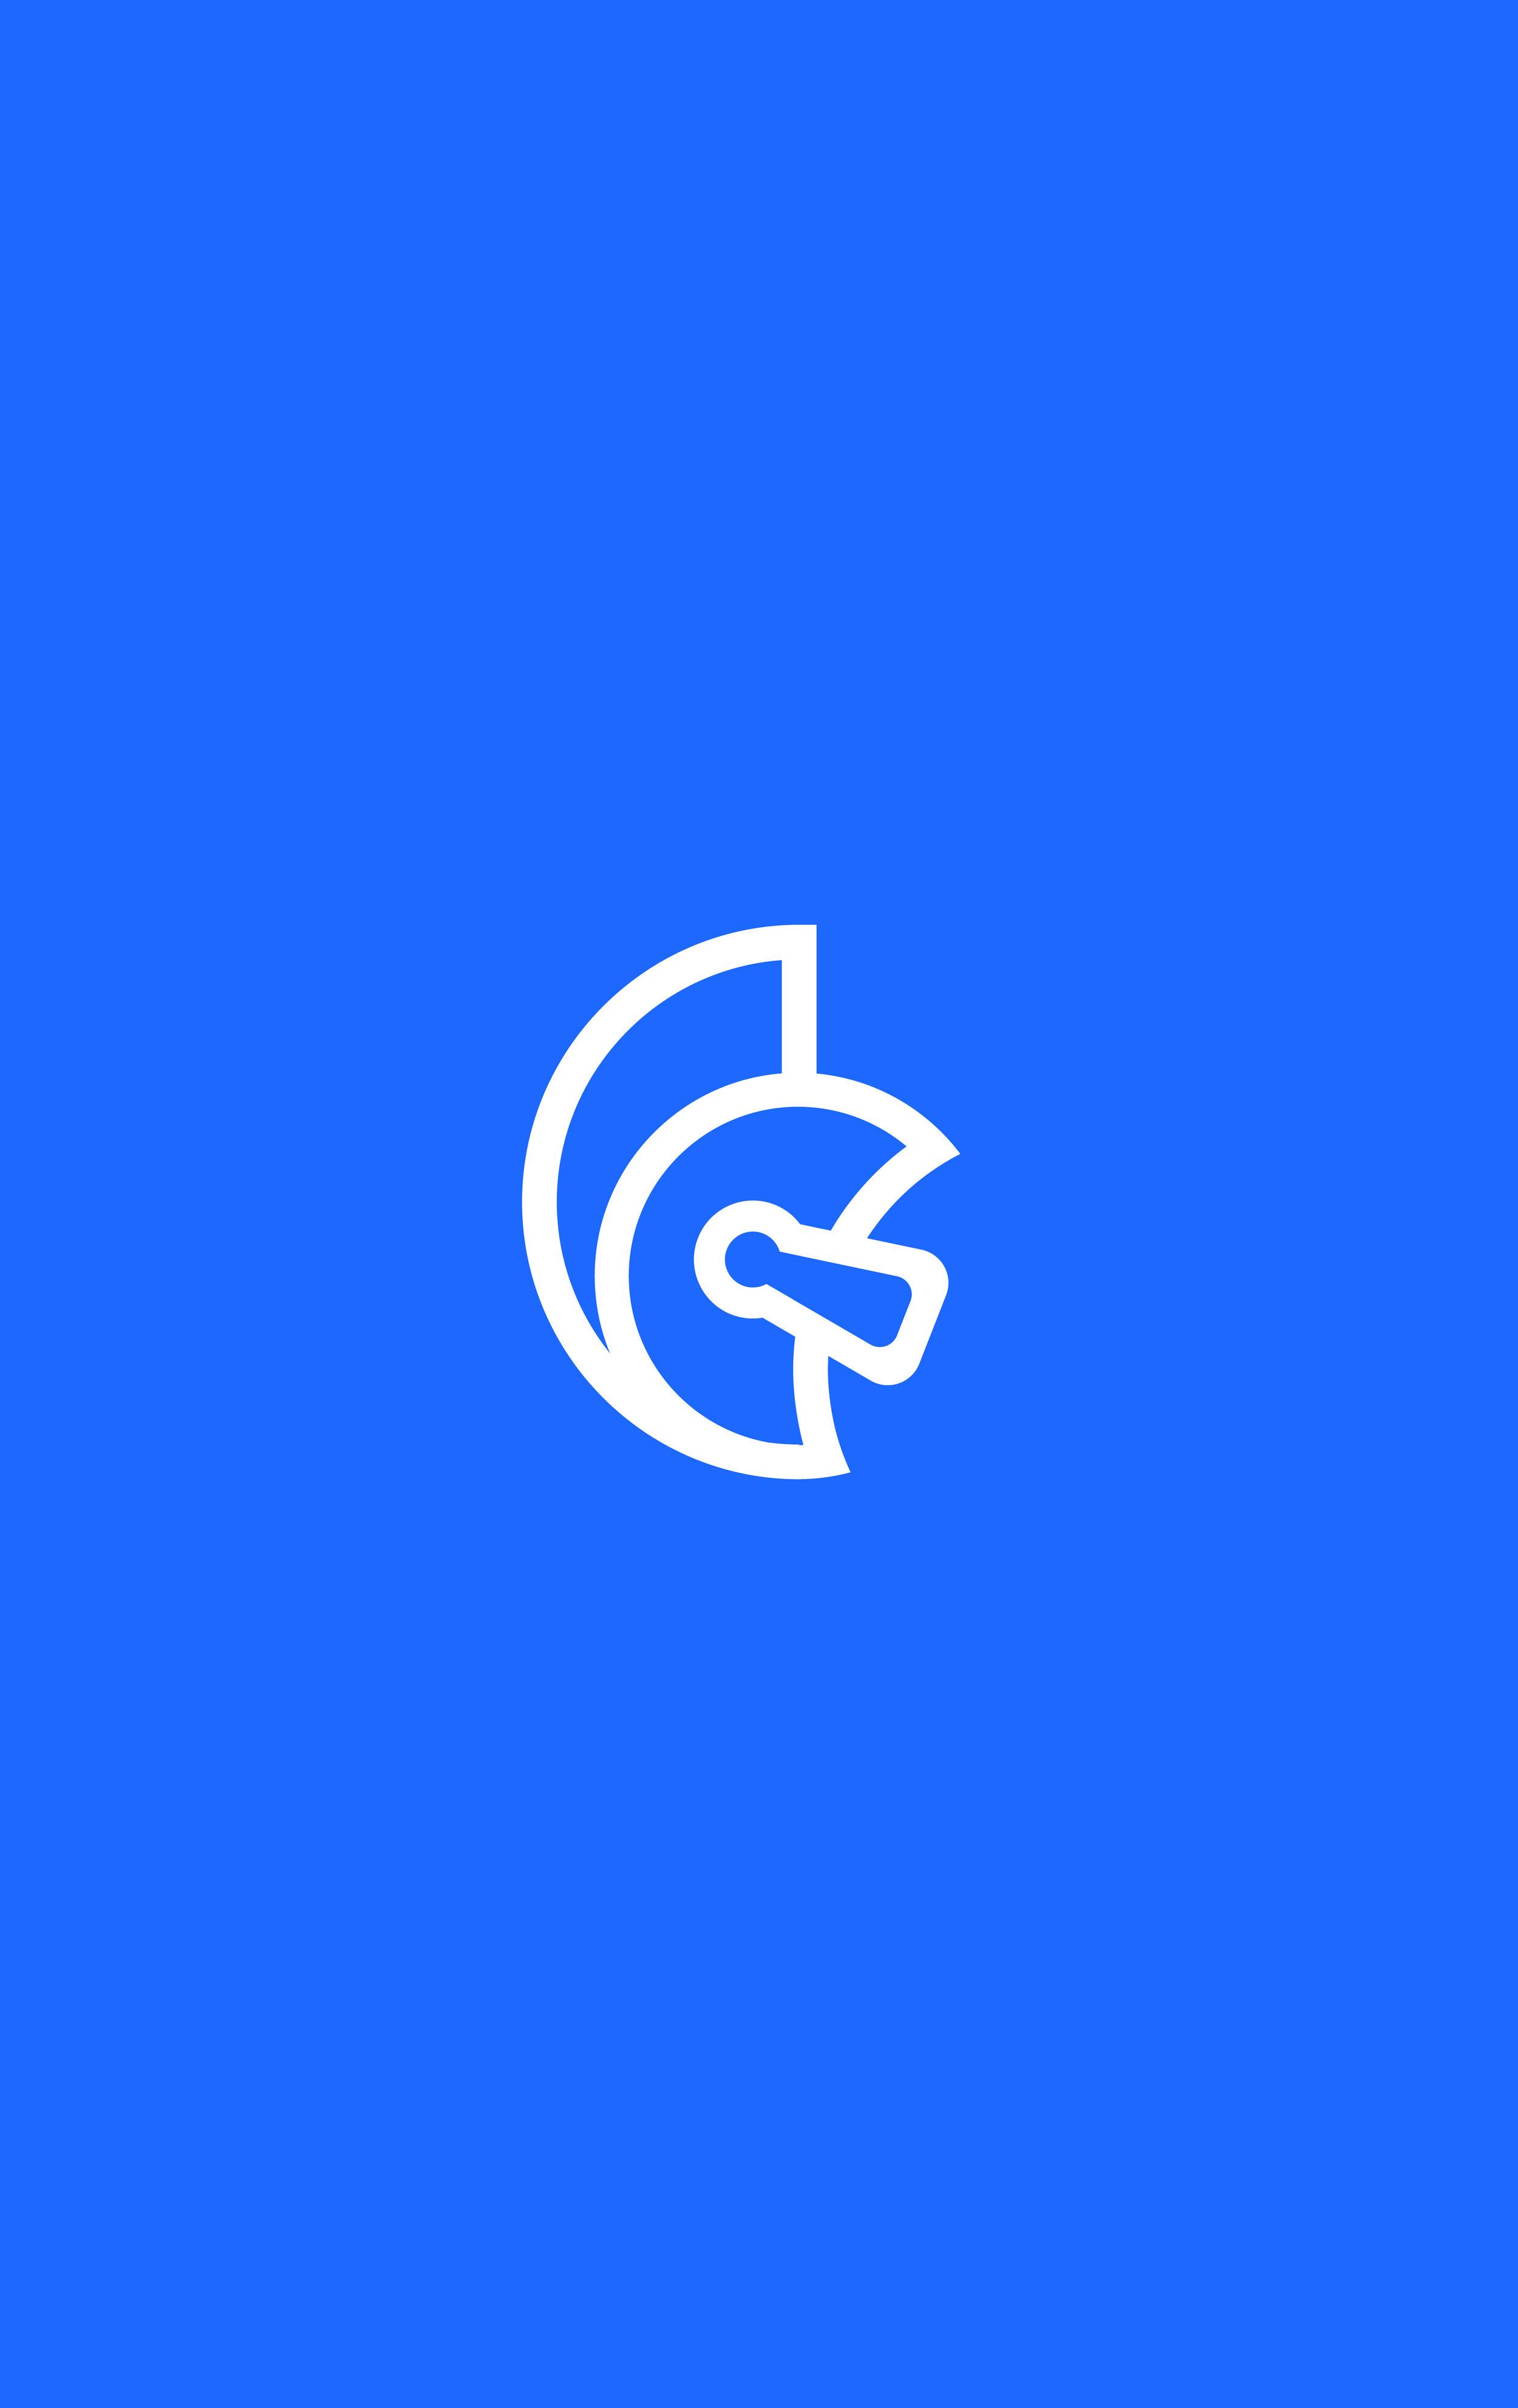 Blue bastion symbol.jpg